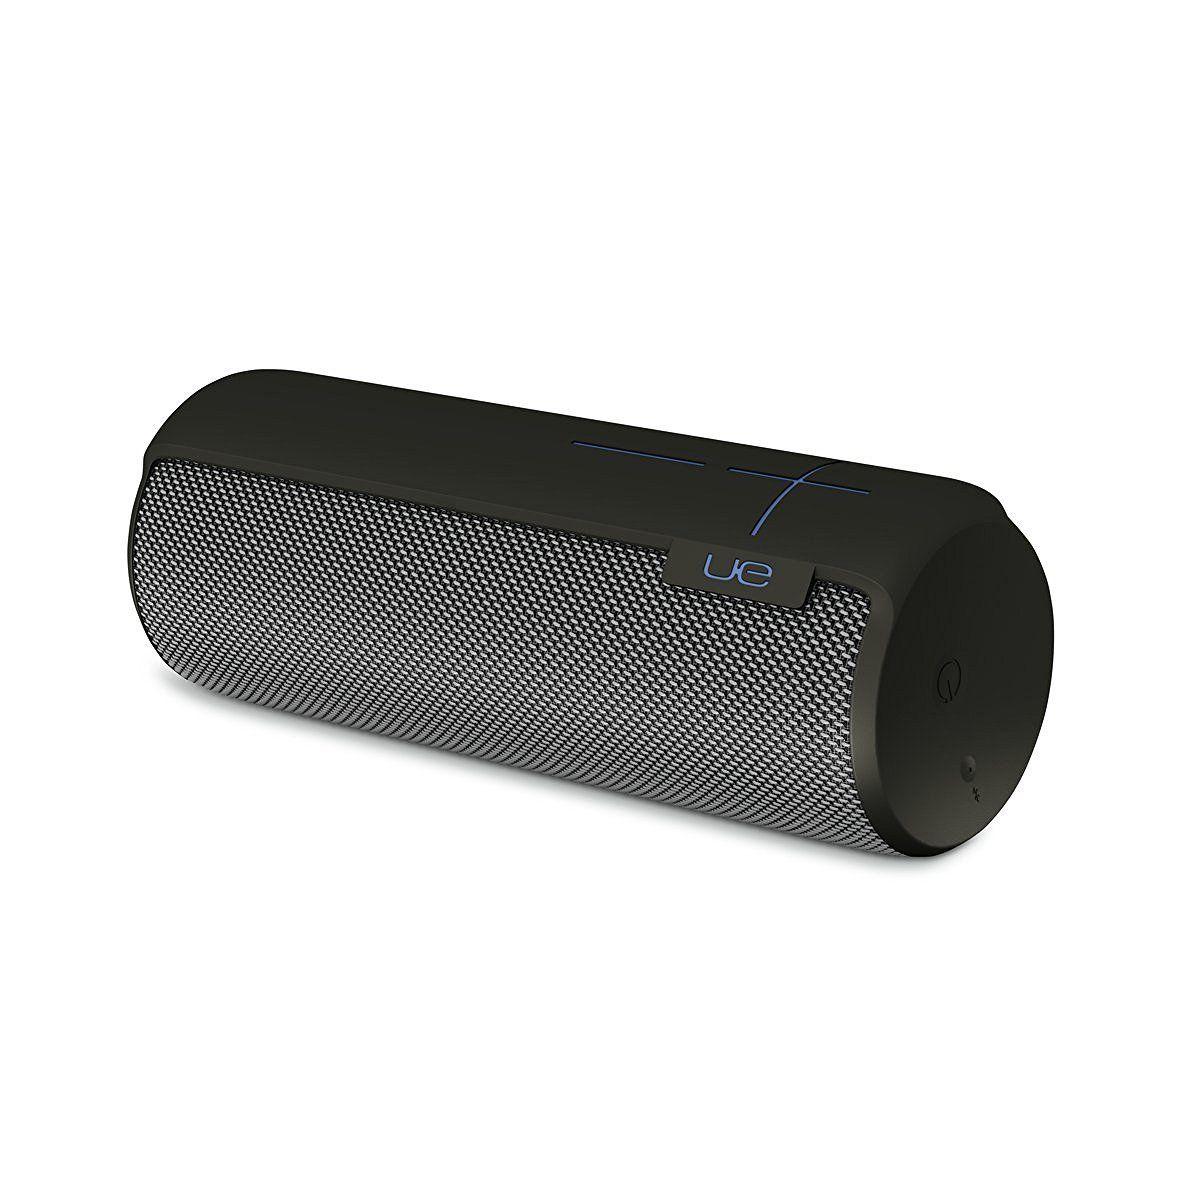 Ultimate Ears UE Megaboom - Tragbarer Bluetooth Lautsprecher @ebay 159,99€